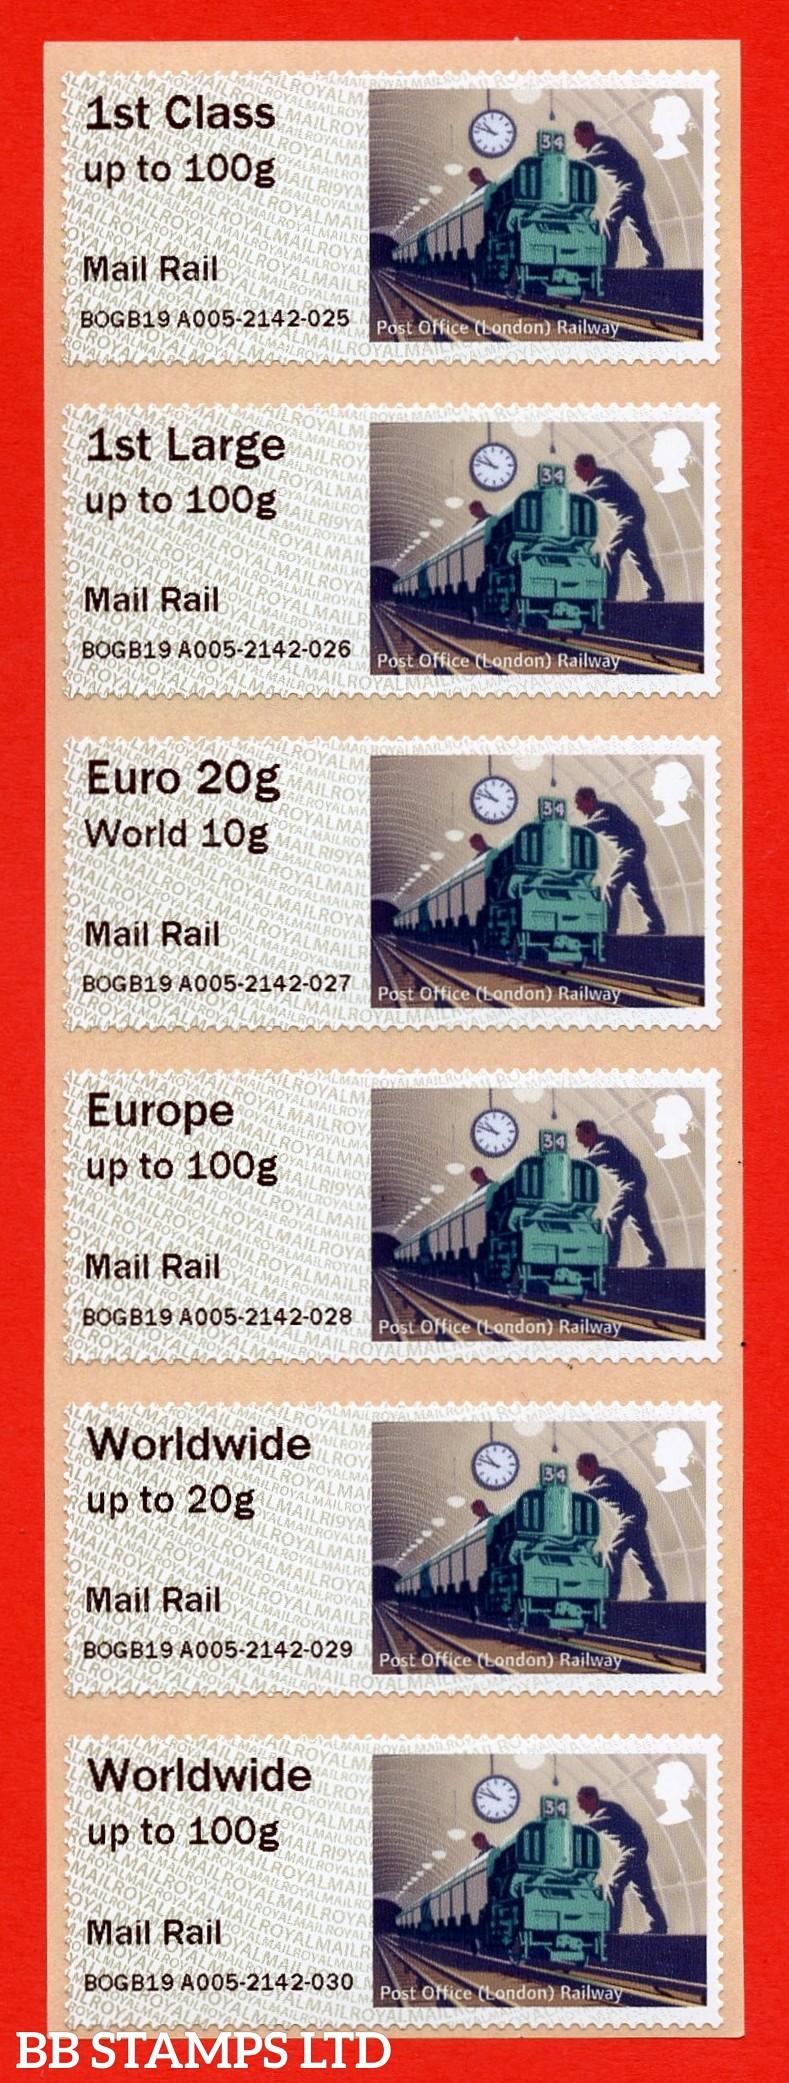 Underground Rail: Mail Rail, 1st - W/Wide 100g Type IIIA digitally printed: R19Y (set of 6) (BK29,P4)